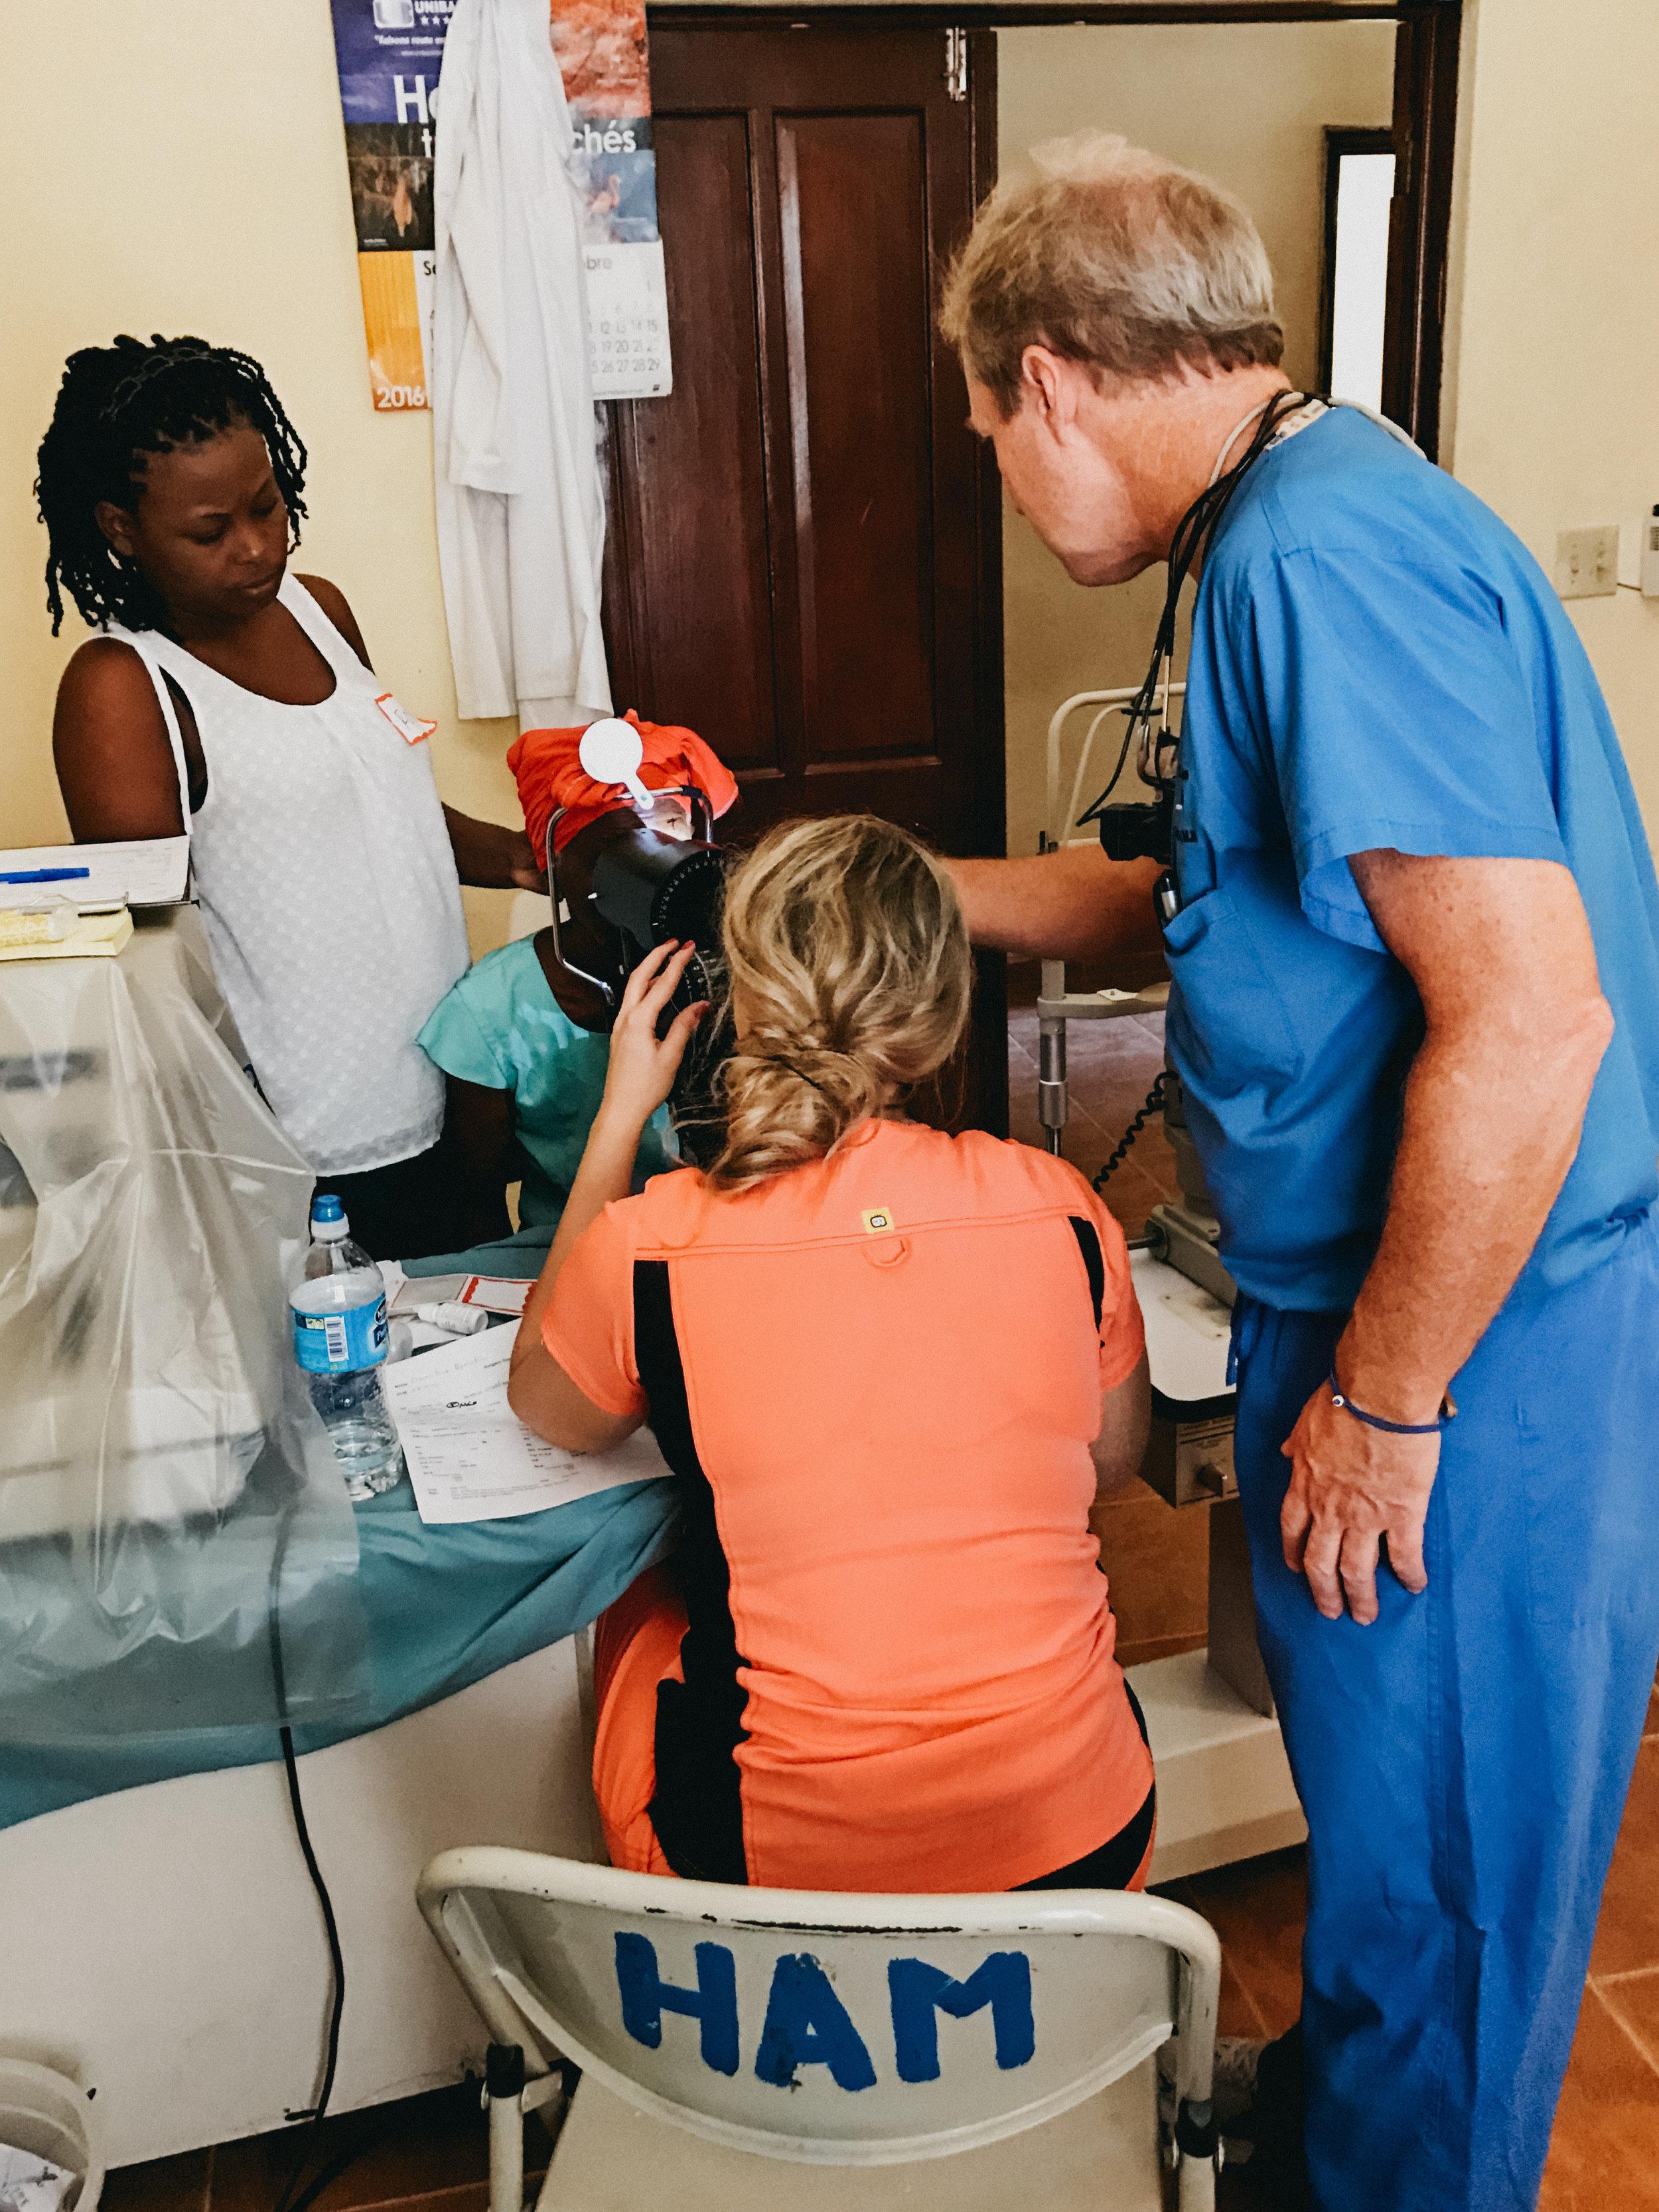 Haiti_Medical_Missions_Healing_Art_Missions006.JPG